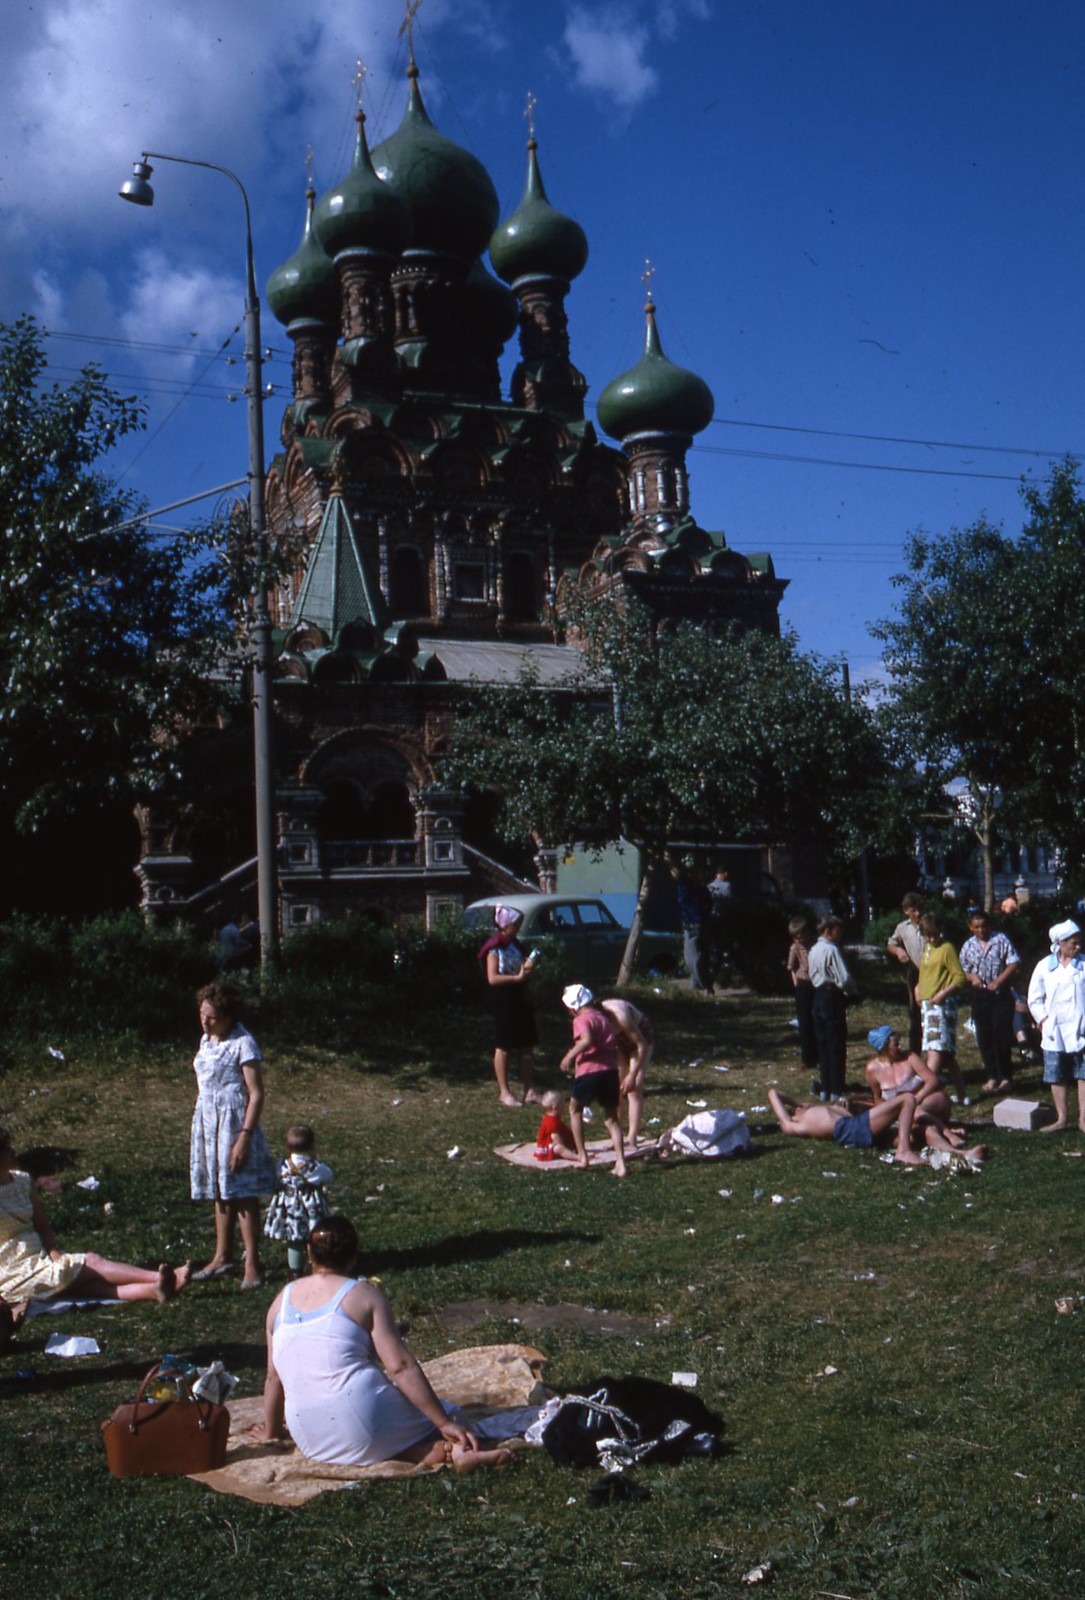 hammond-MA10-Ostankino-people-sunbathing-and-fishing-009